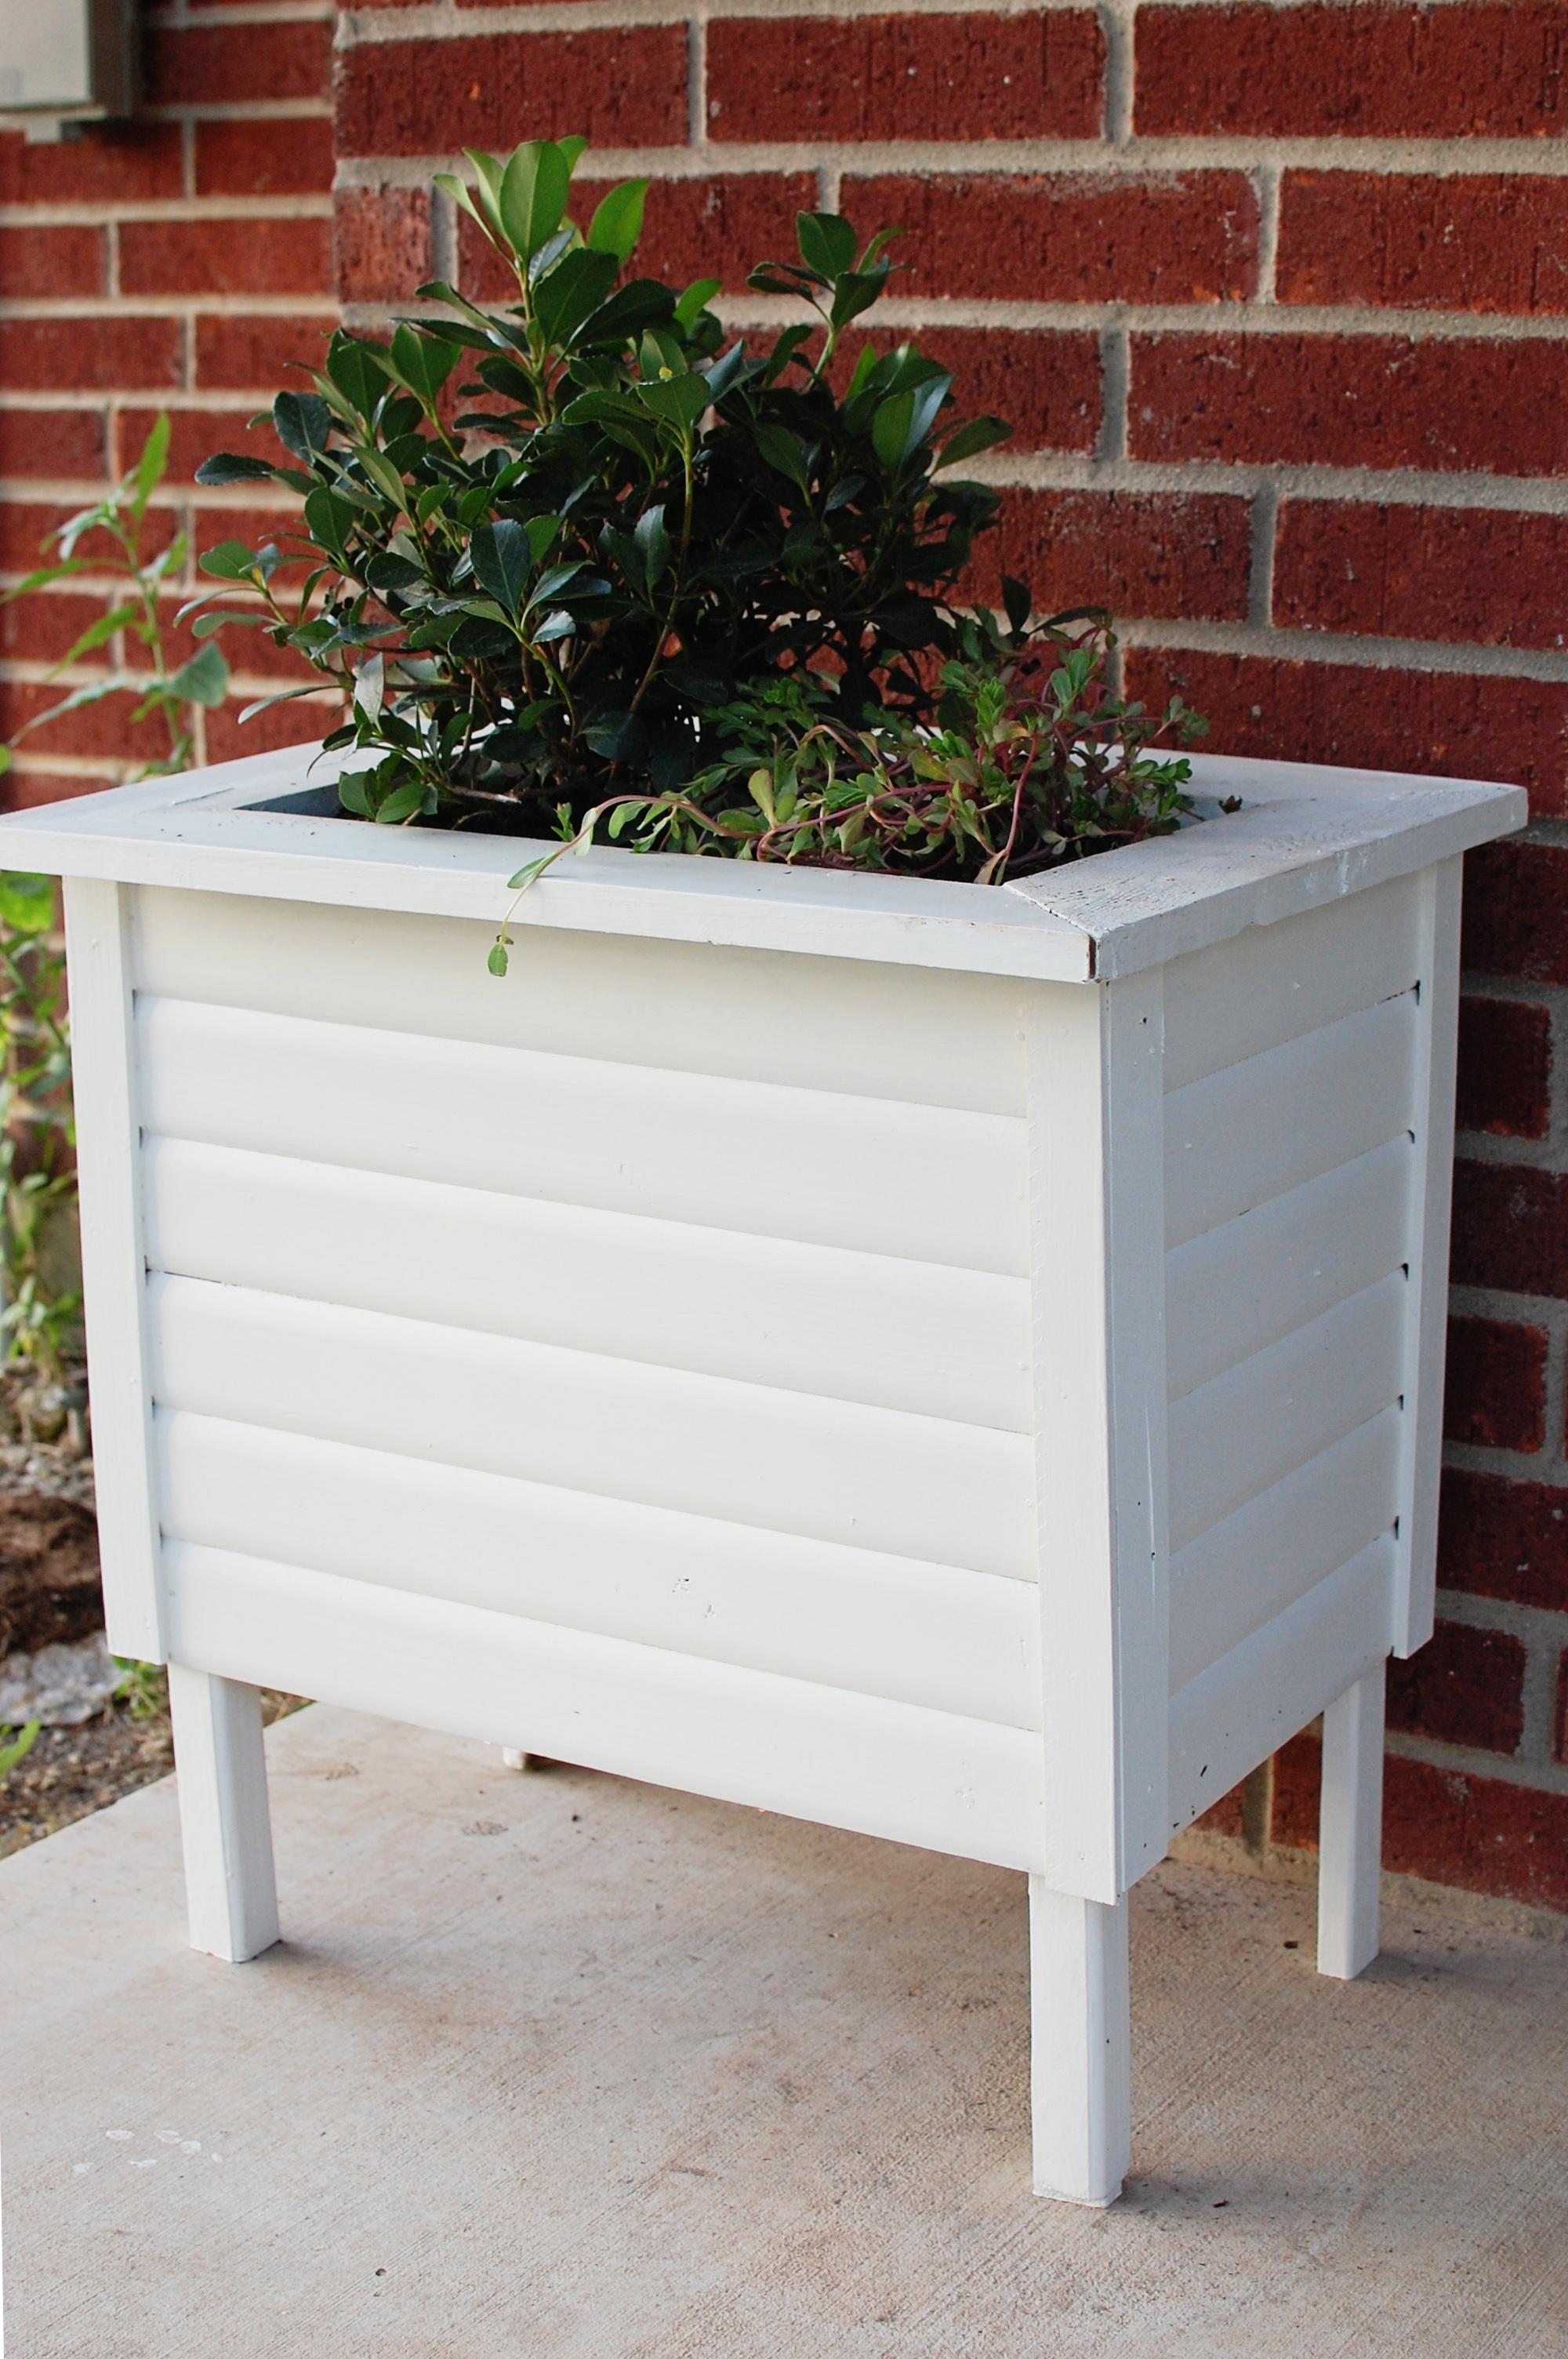 Build a Box Planter